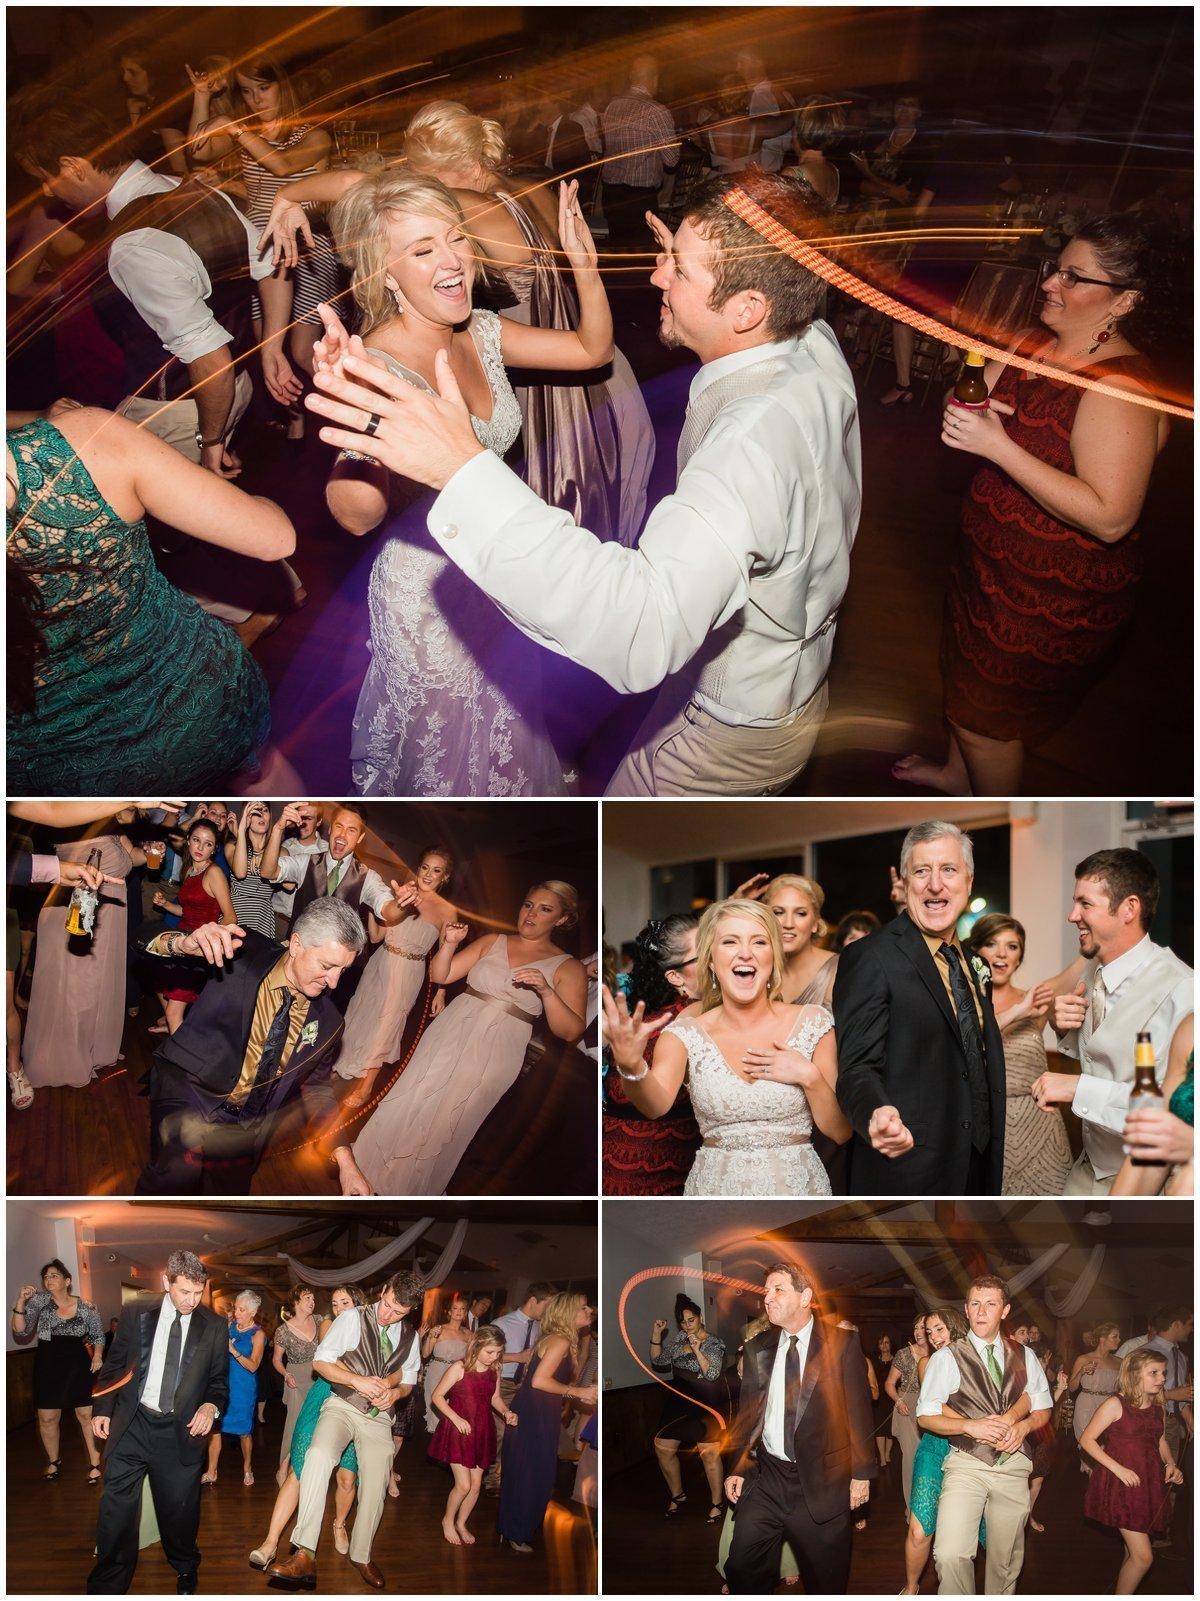 Becca-Tony-Houston-Wedding-The Admiral on Clear Lake 94